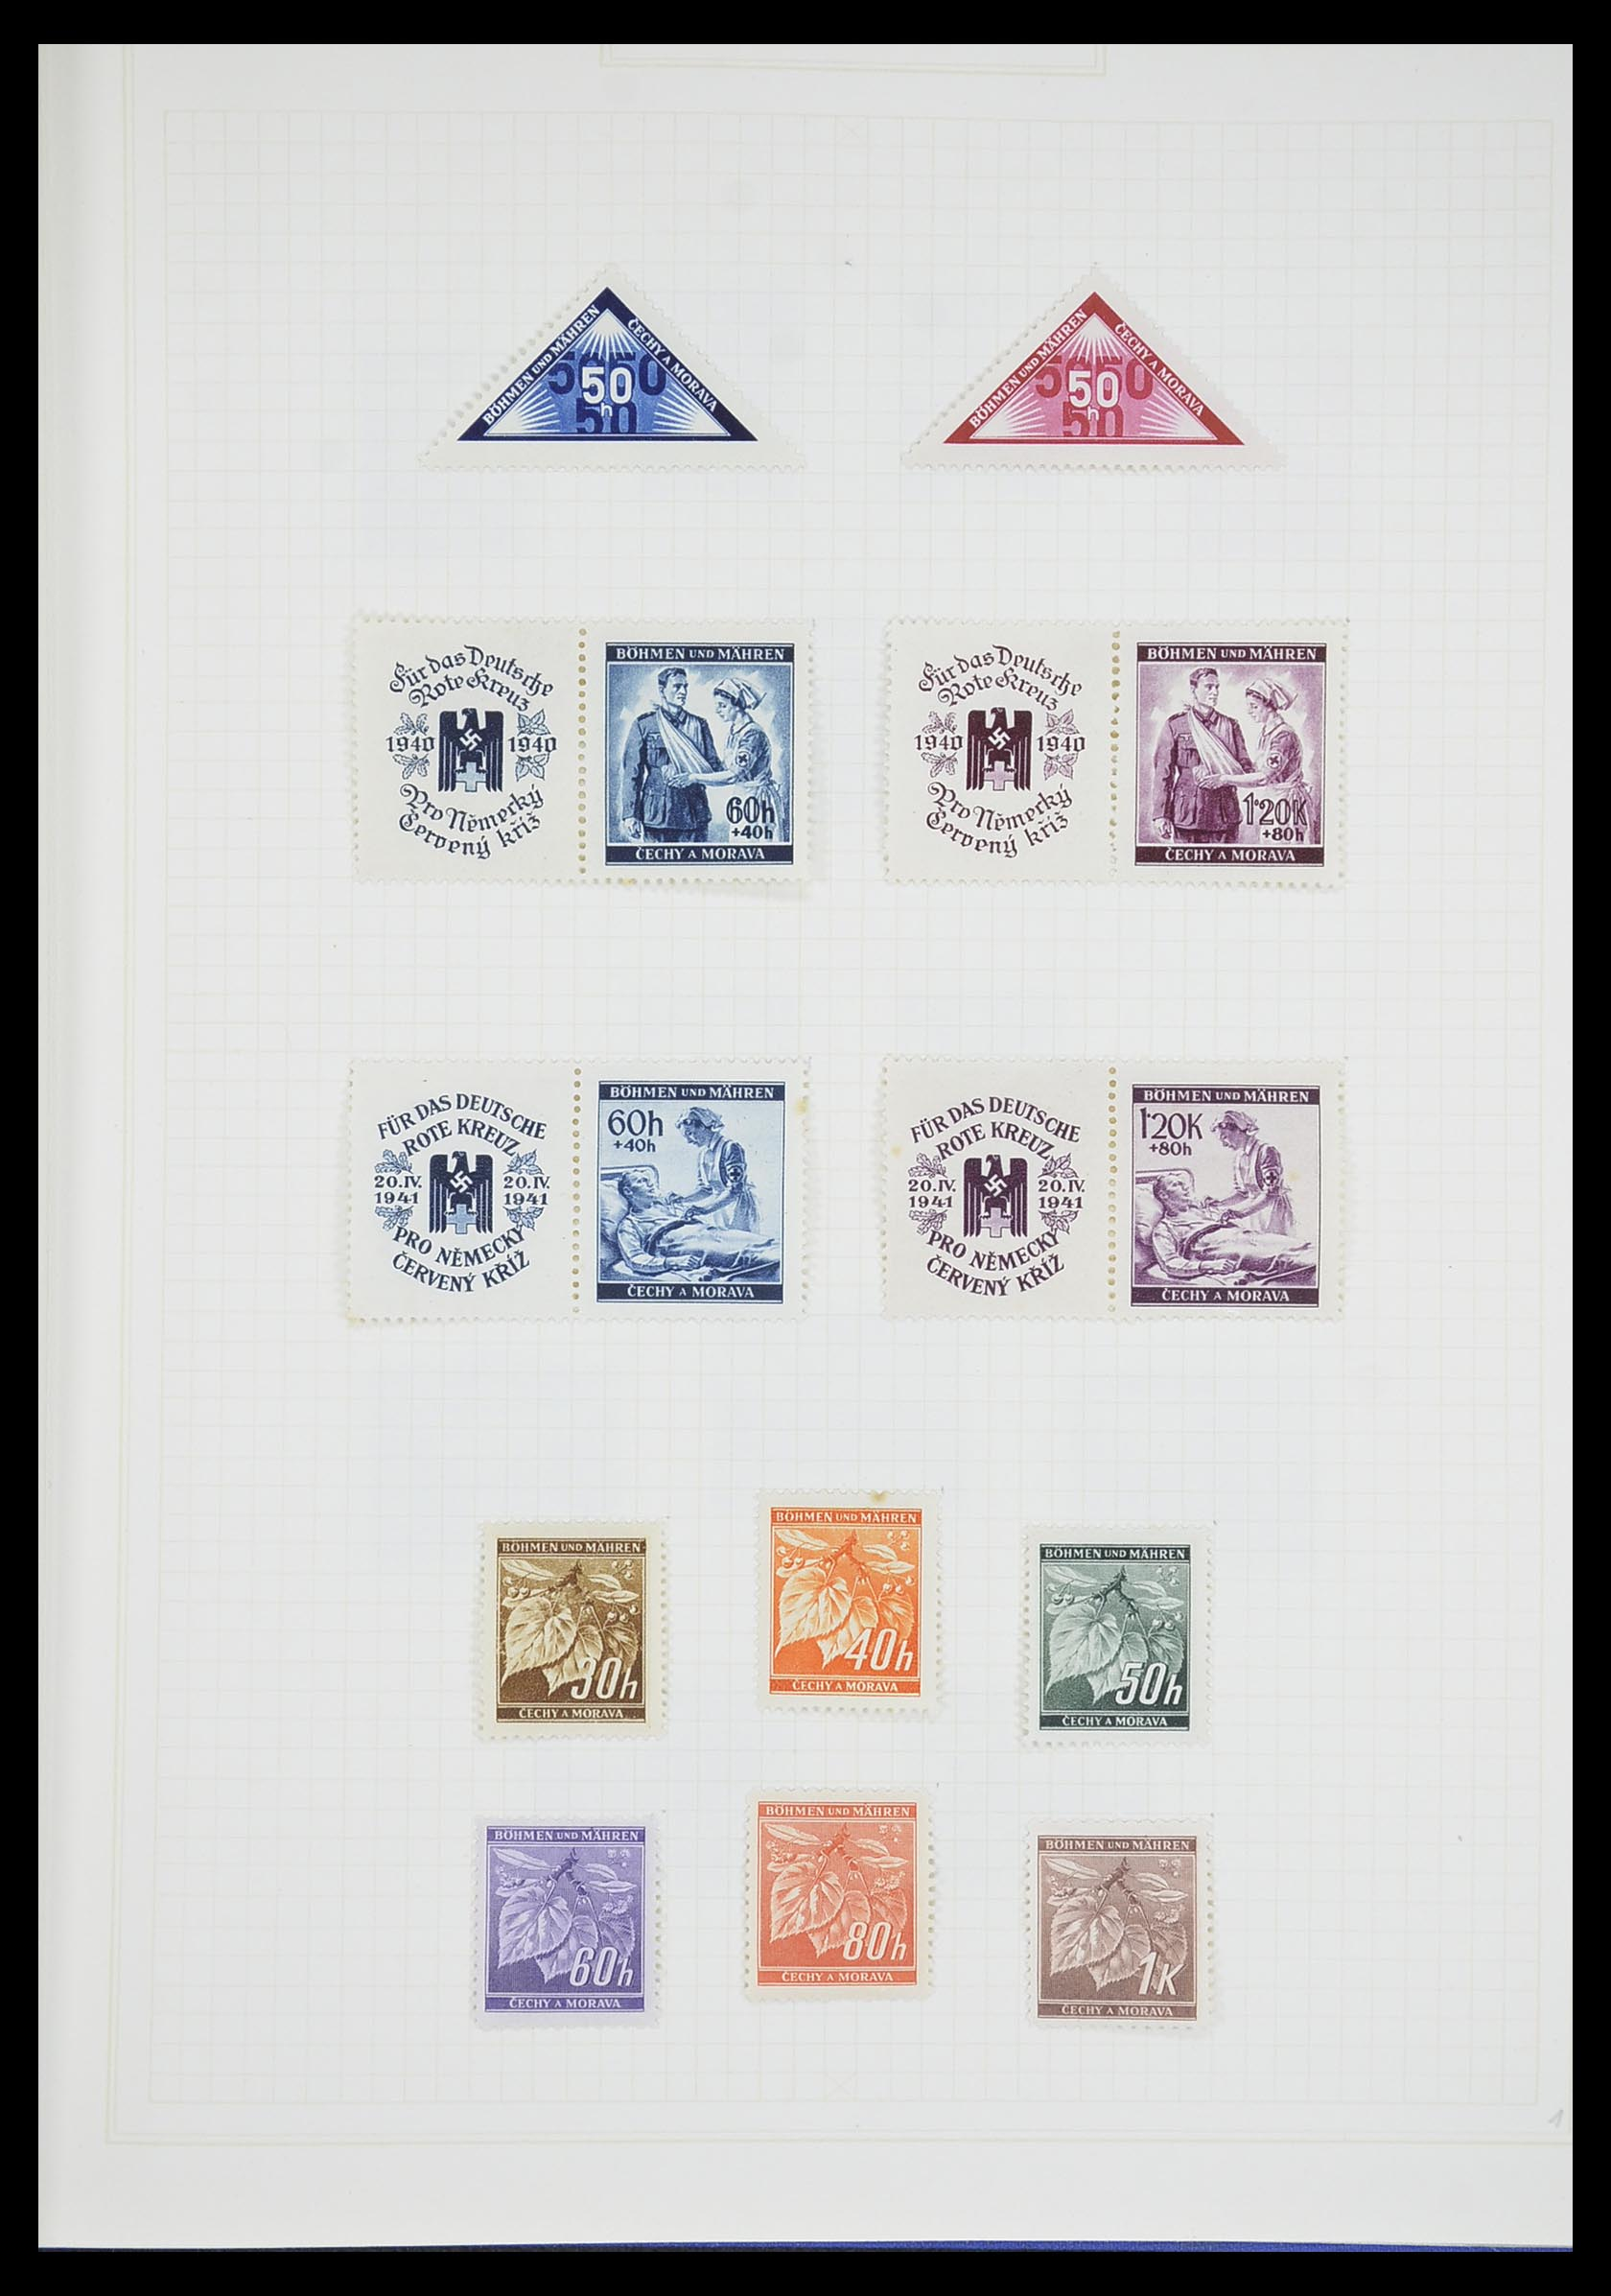 33713 014 - Postzegelverzameling 33713 Duitse bezettingen WO I en WO II 1914-1945